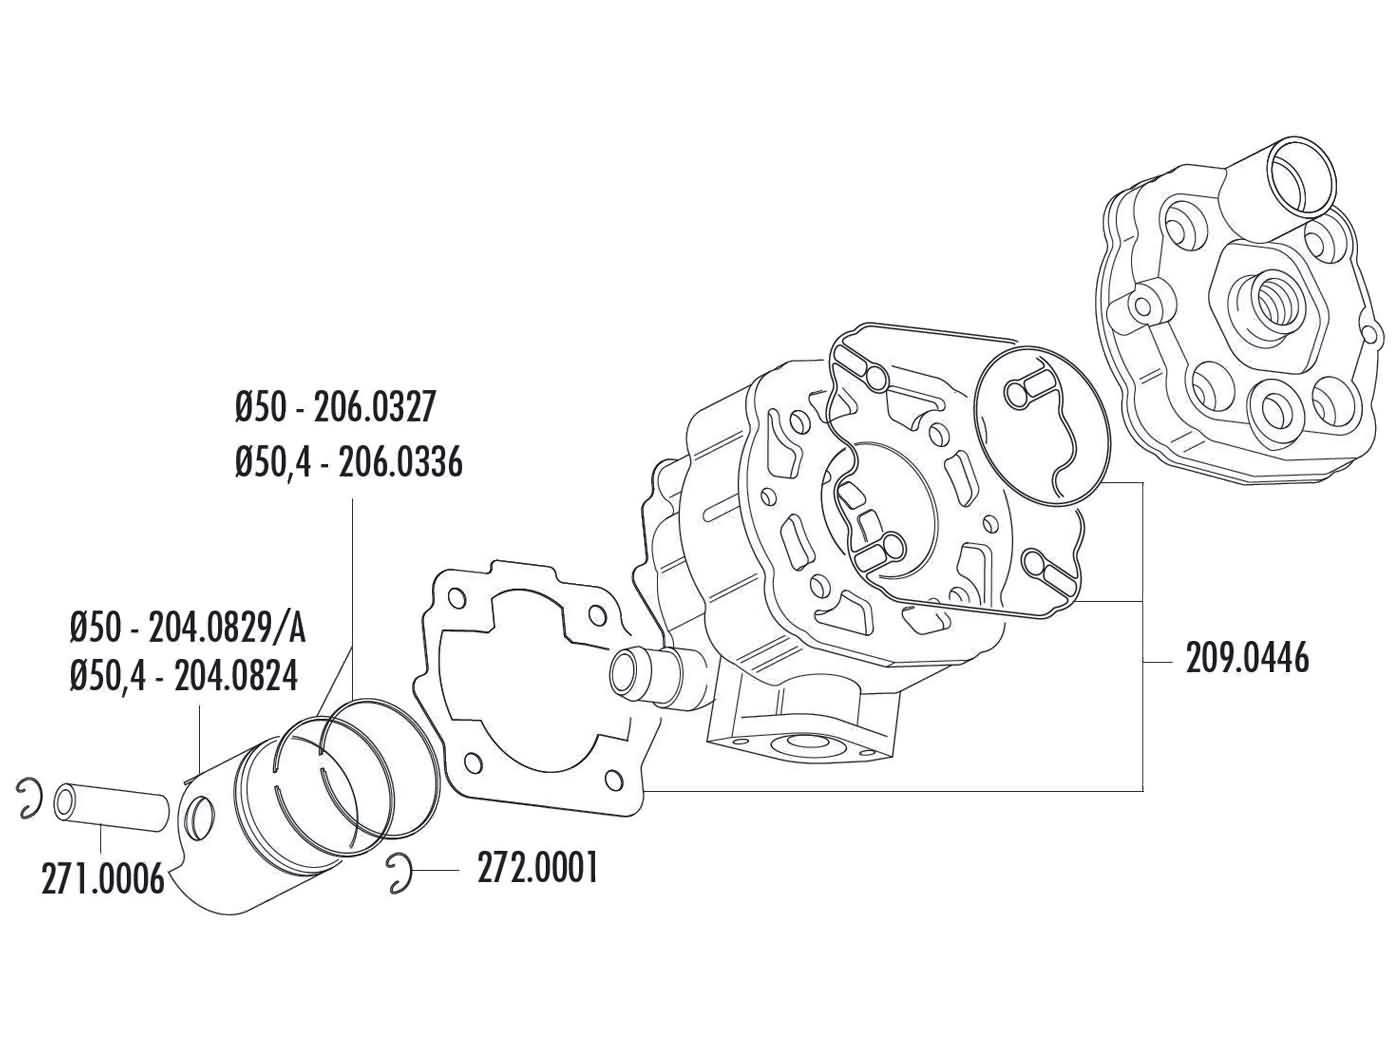 Piston Ring Polini 80cc 50x1mm For Derbi D50b0 Ebe Ebs